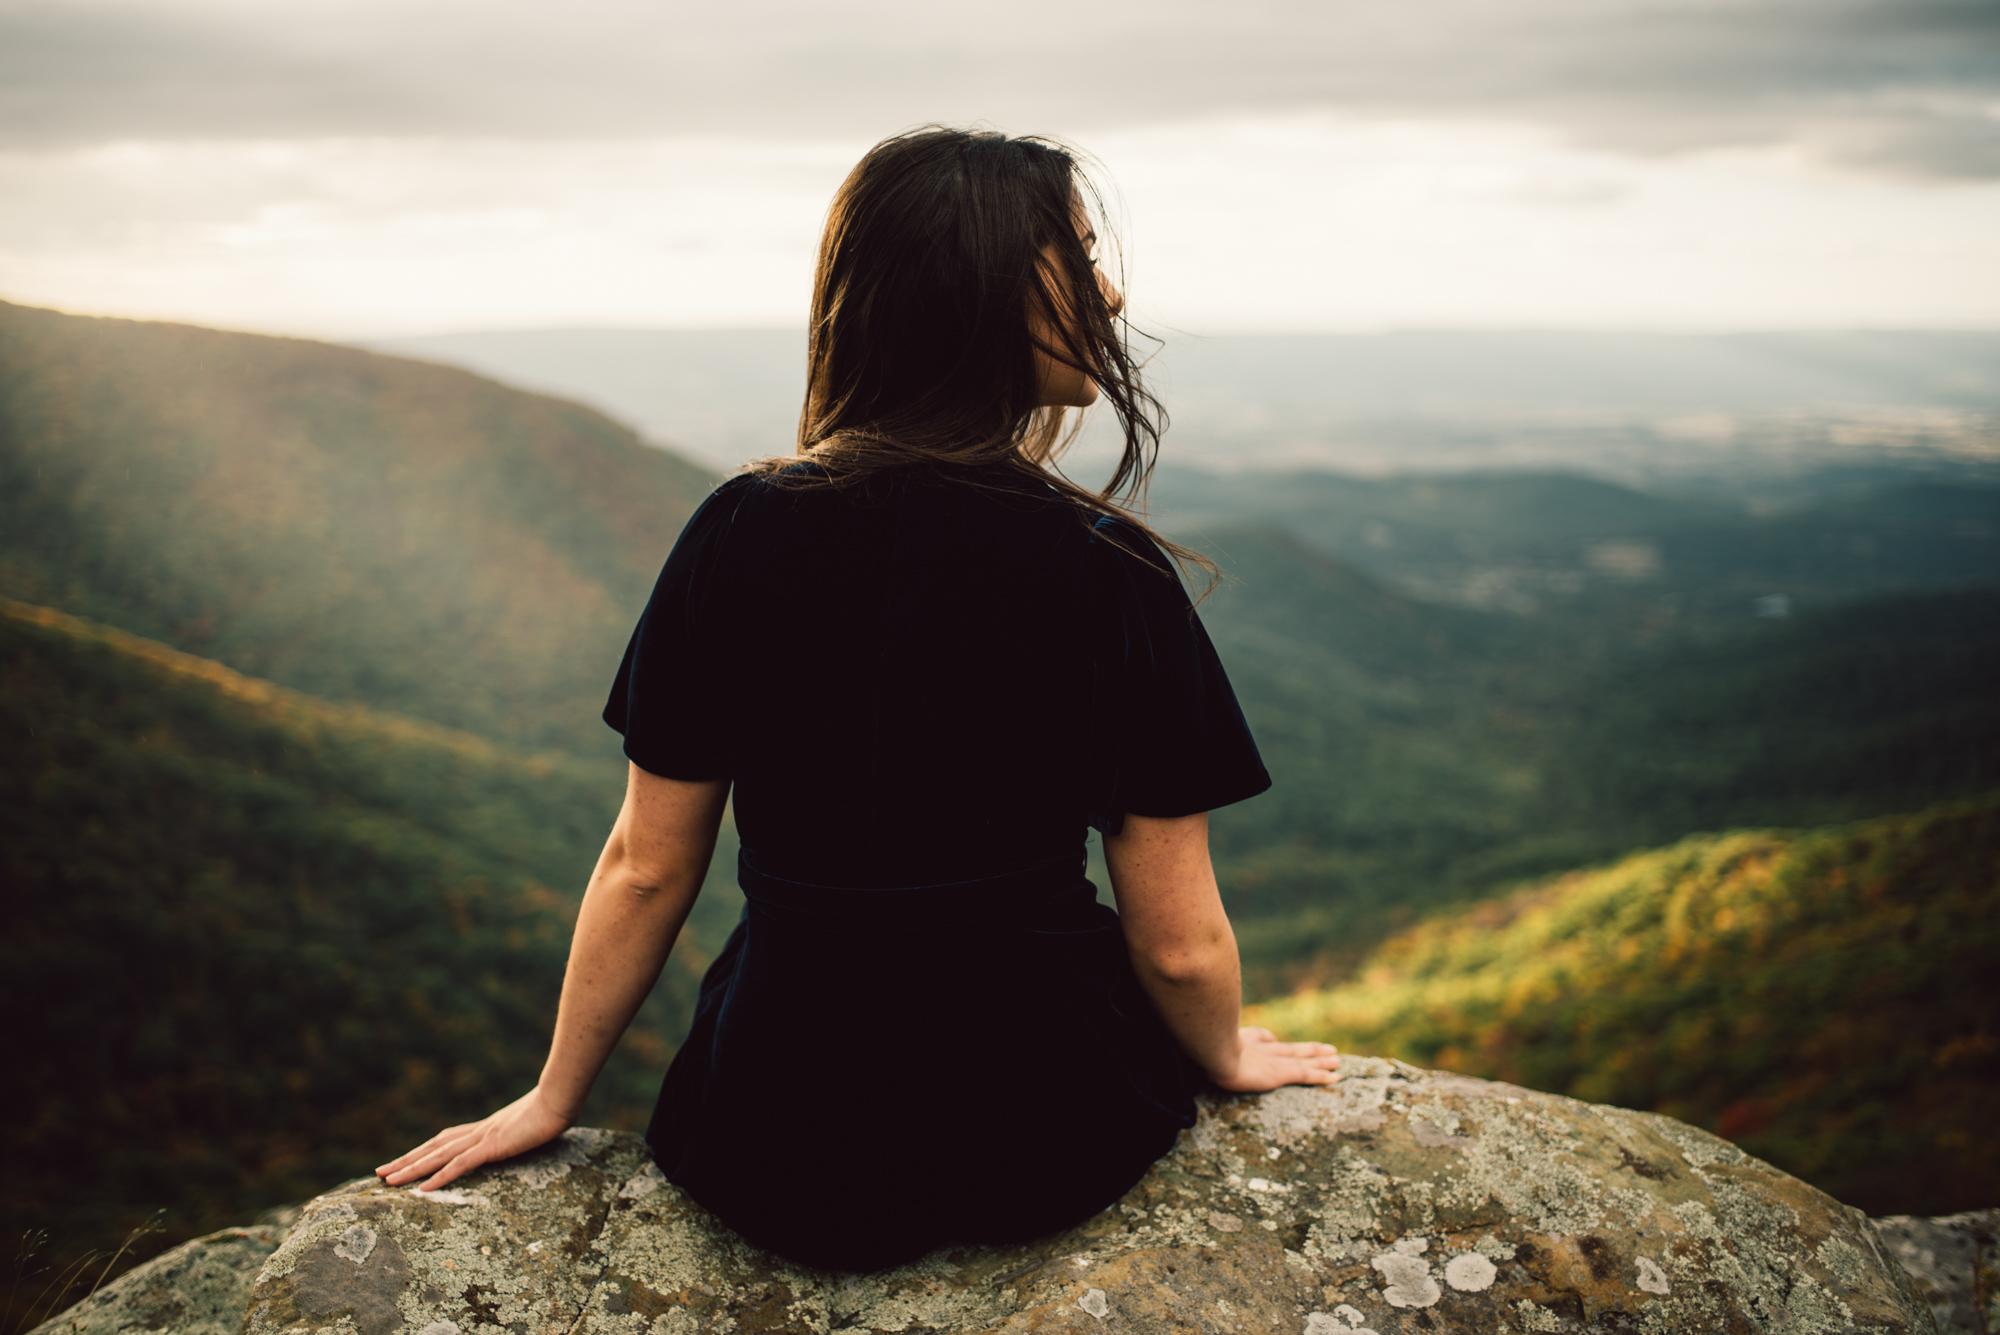 Megan_Shenandoah_National_Park_Windy_Romantic_Portraits_95.JPG